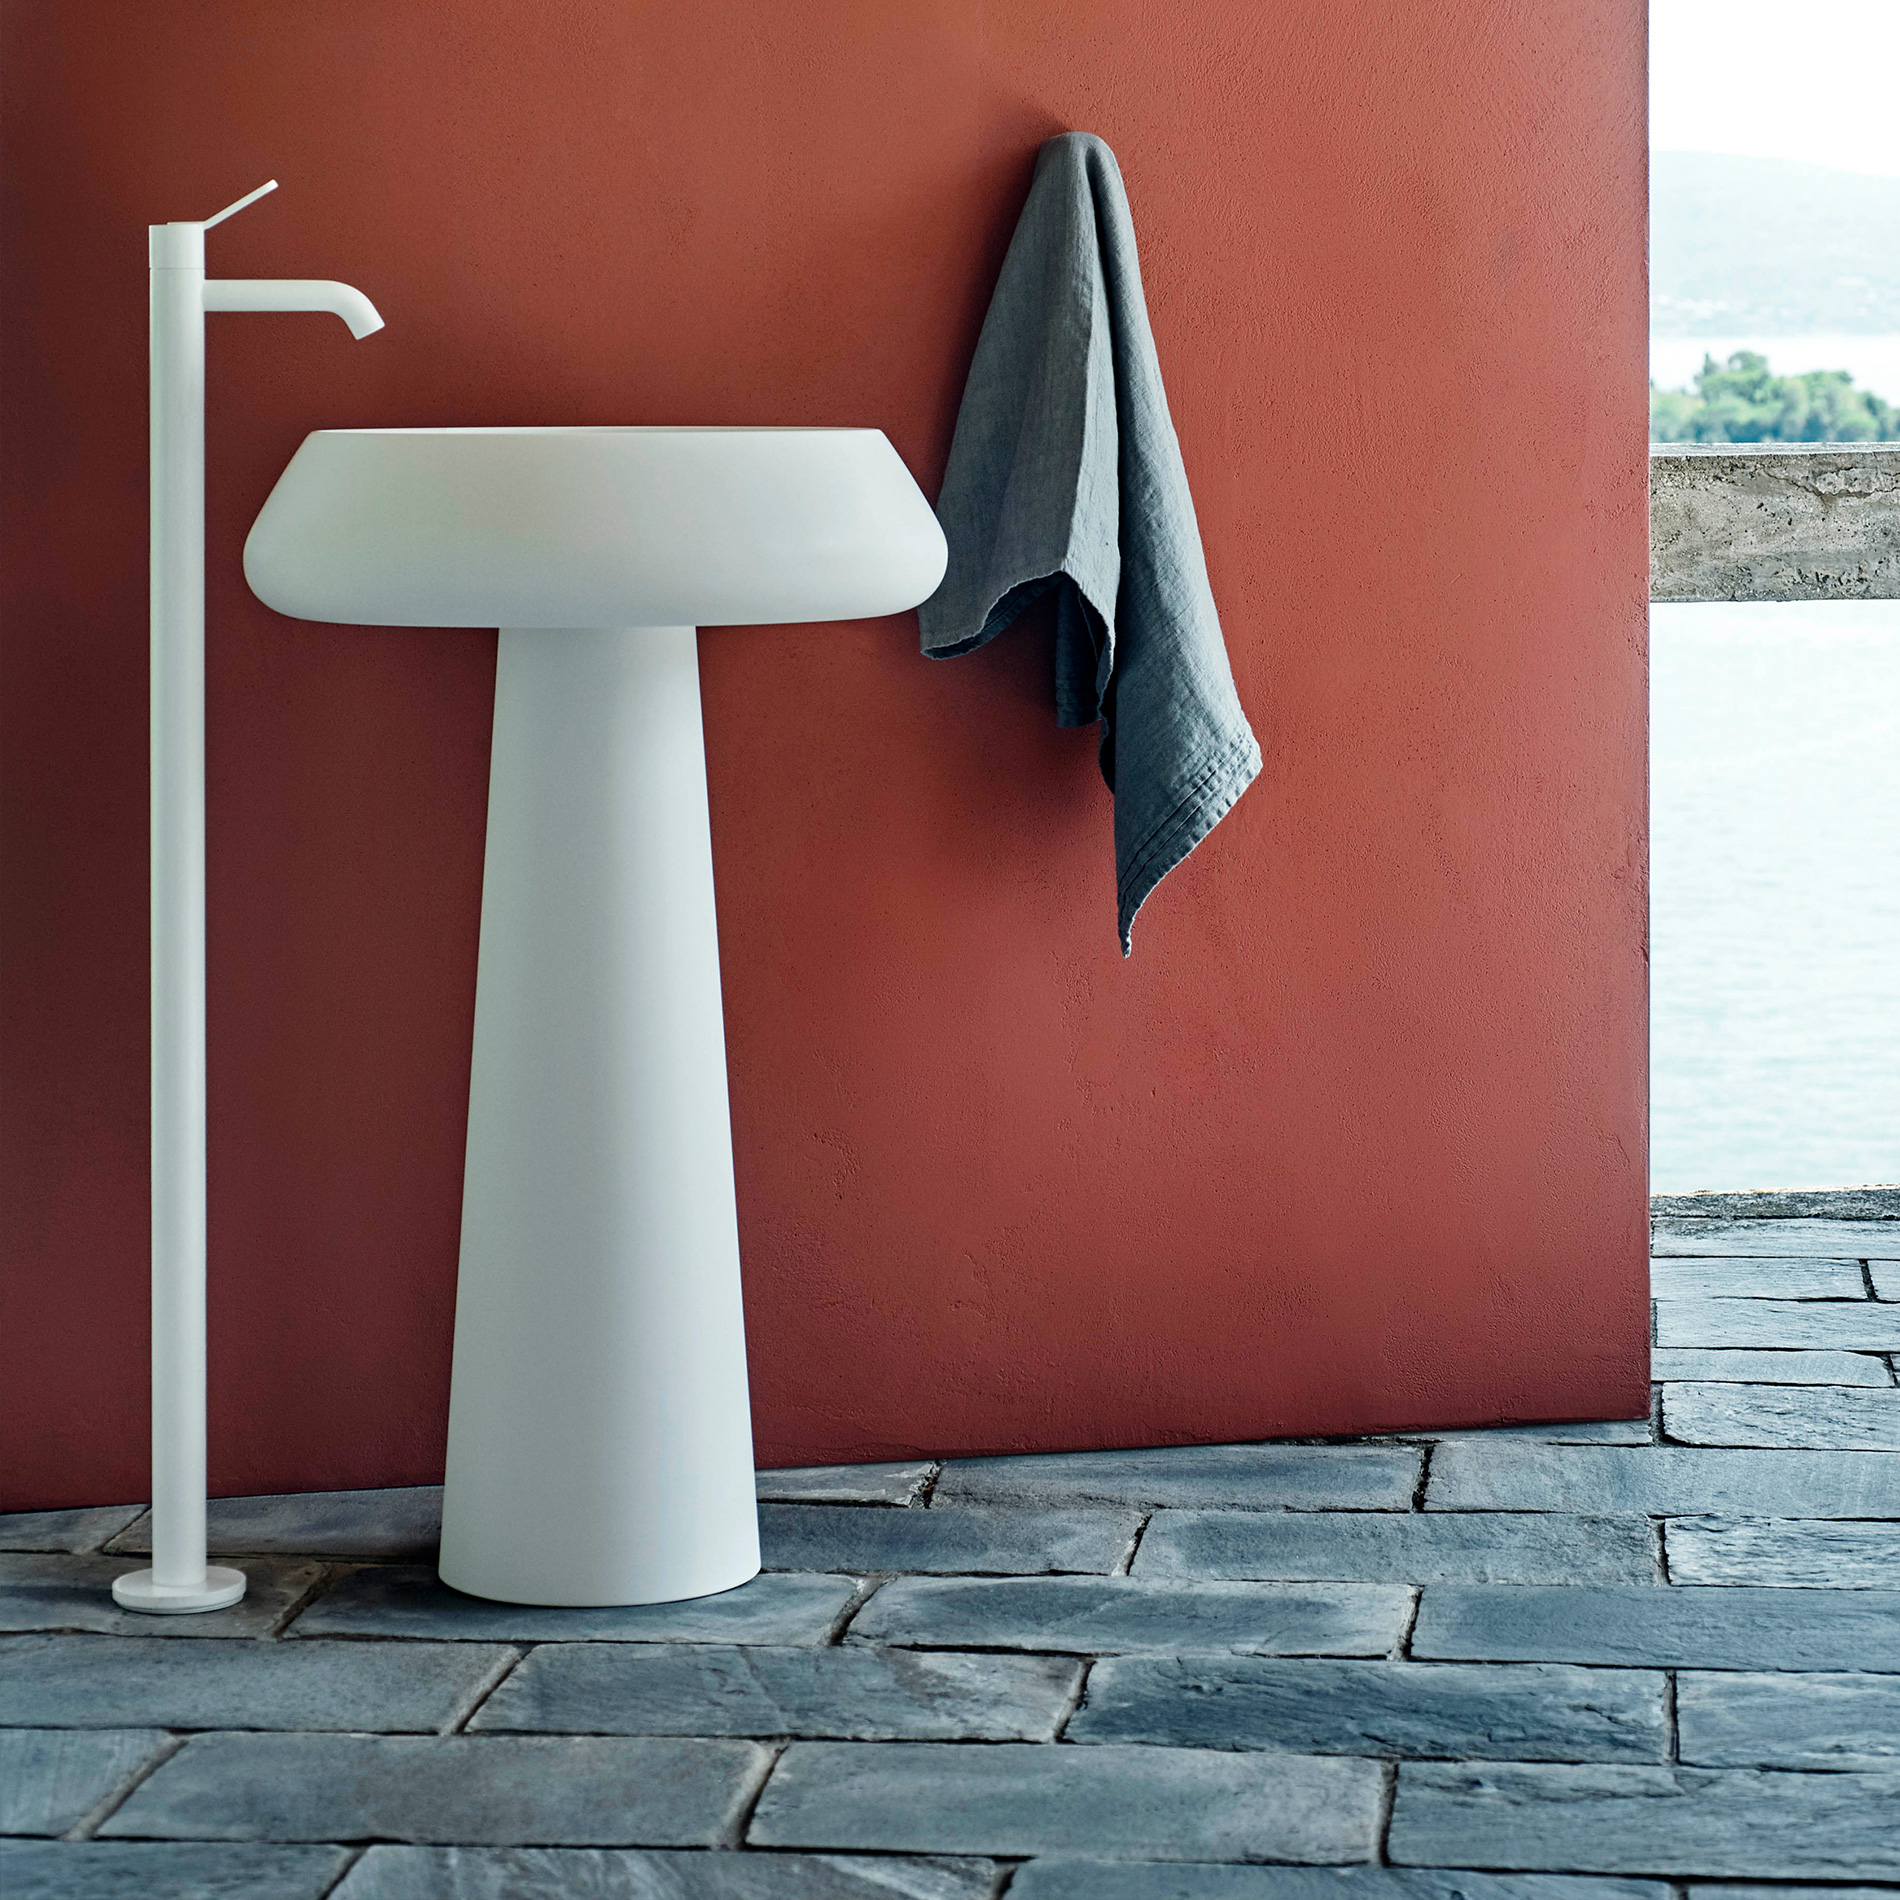 Nicos-International-home-products-Agape-washbasins-1